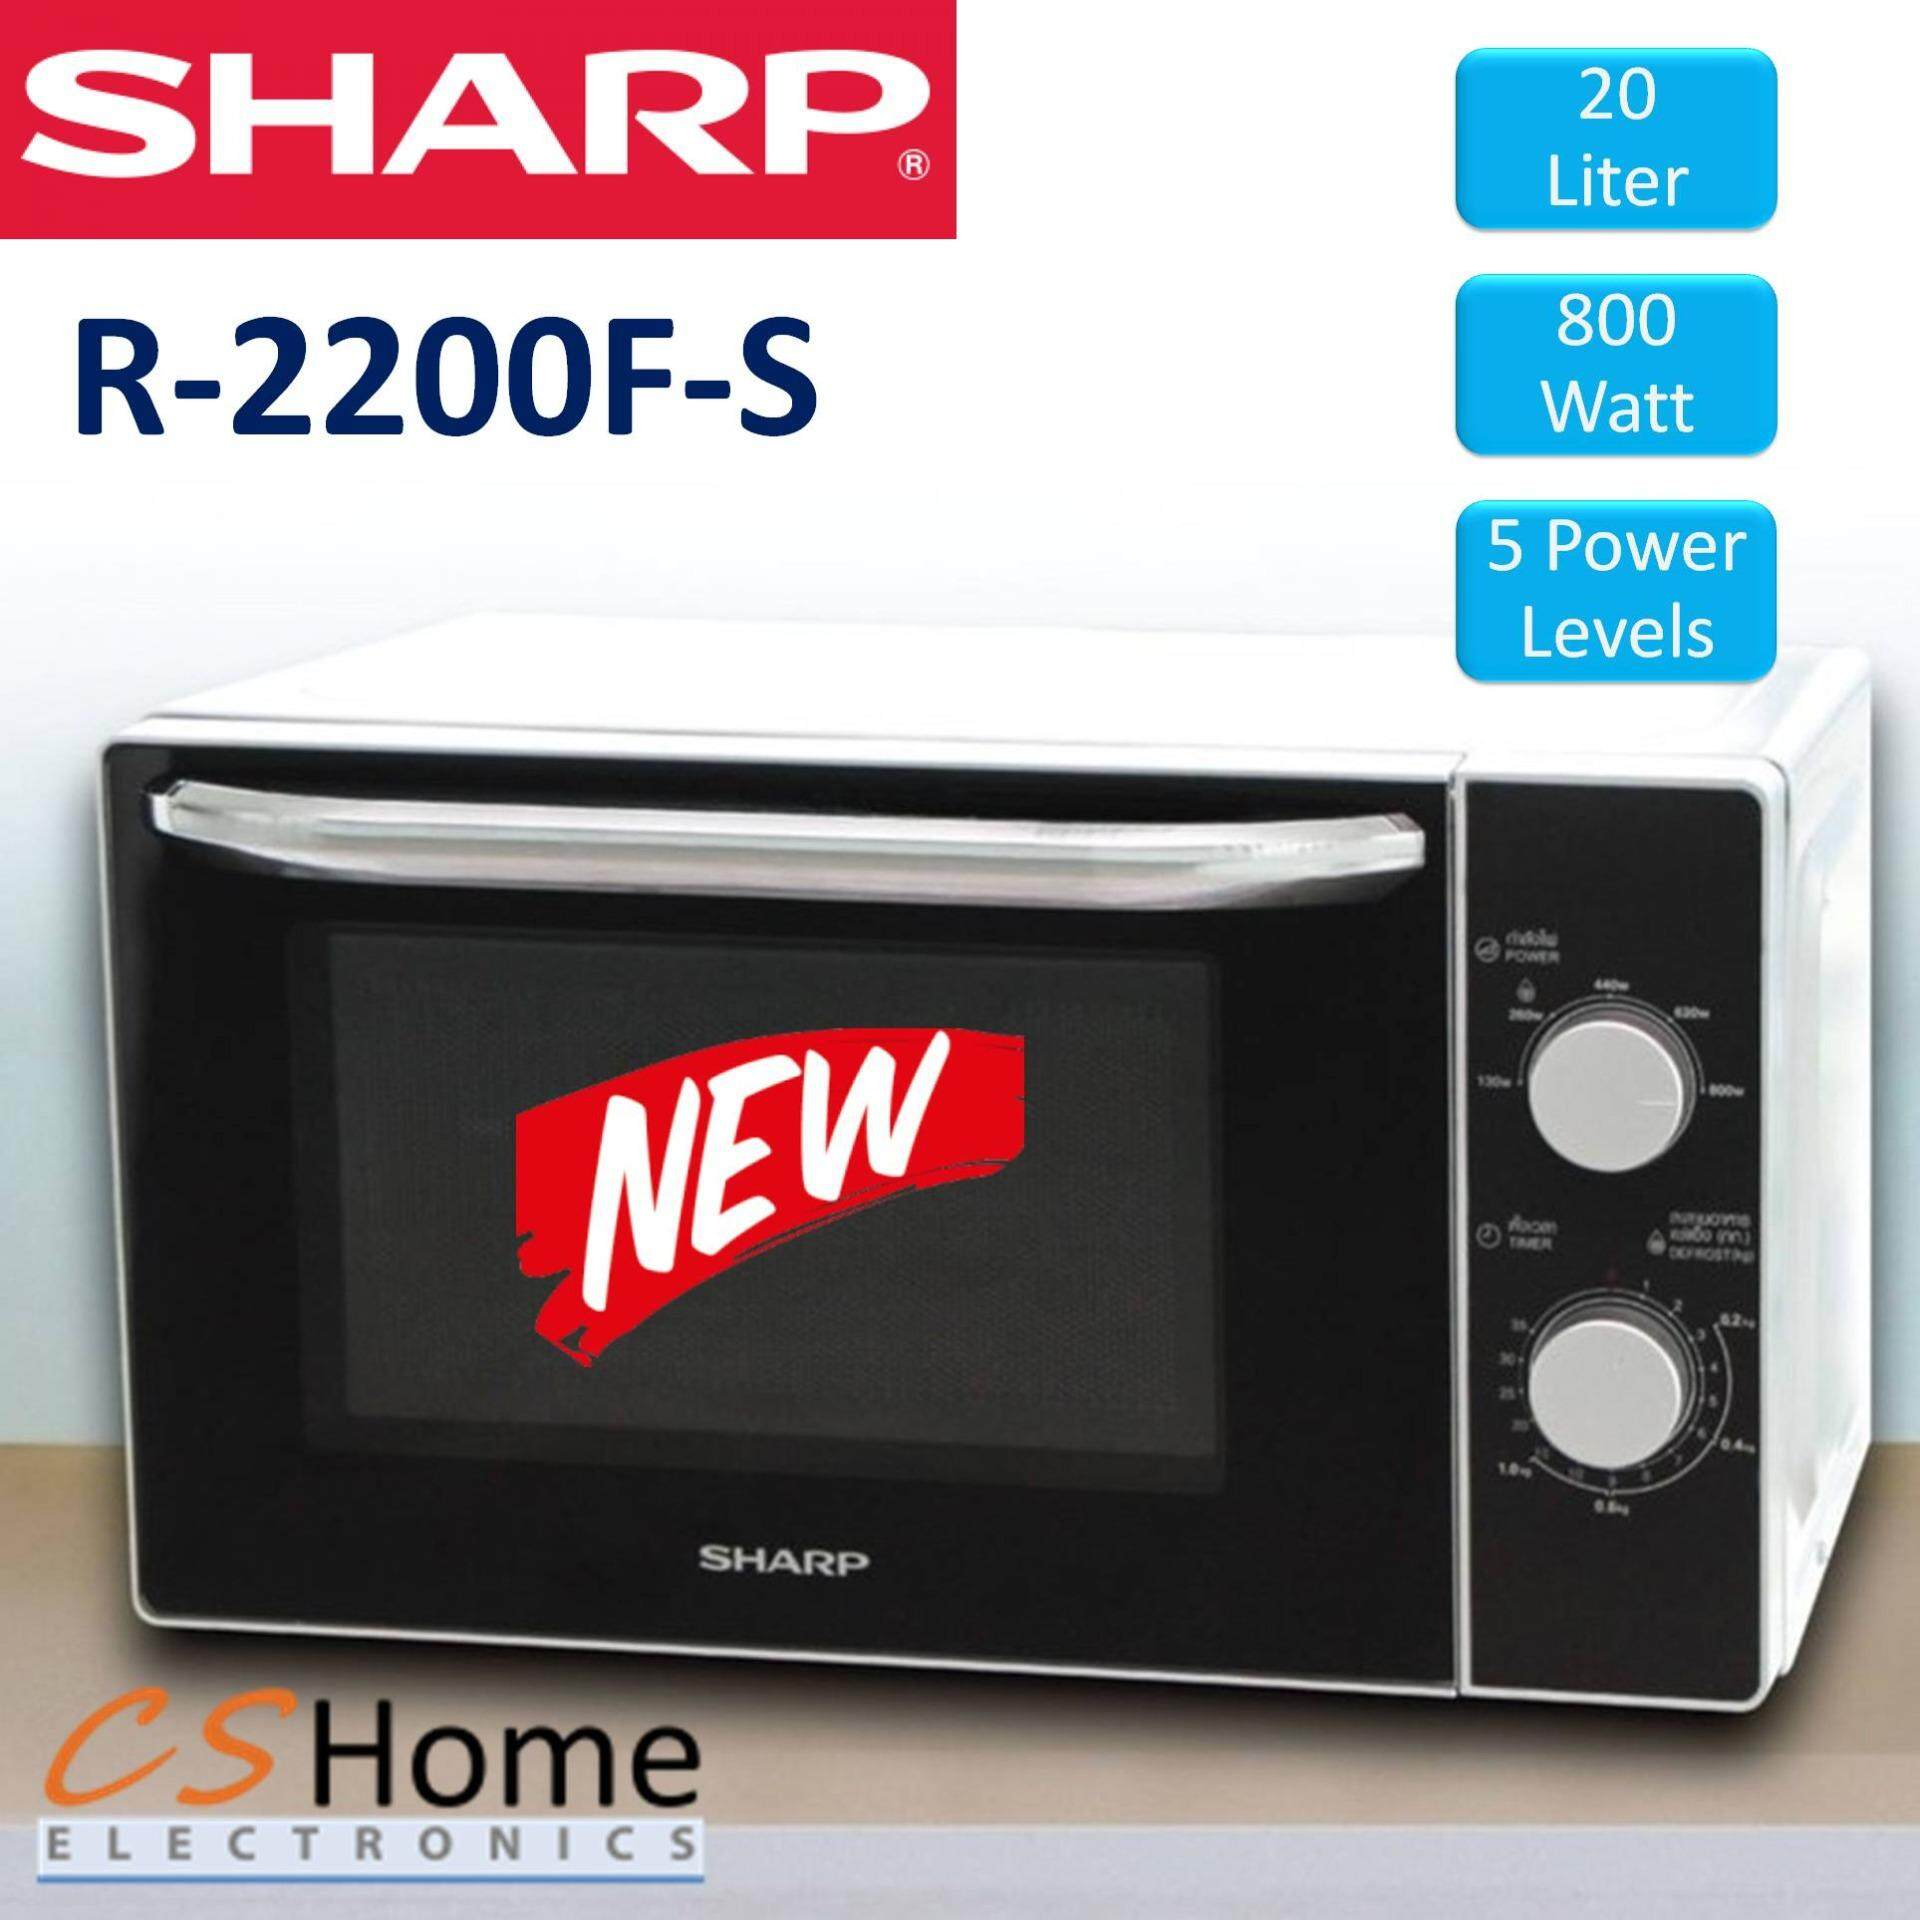 NEW SHARP ไมโครเวฟ R-2200F-S ความจุ 20 ลิตรรับประกัน 5ปี